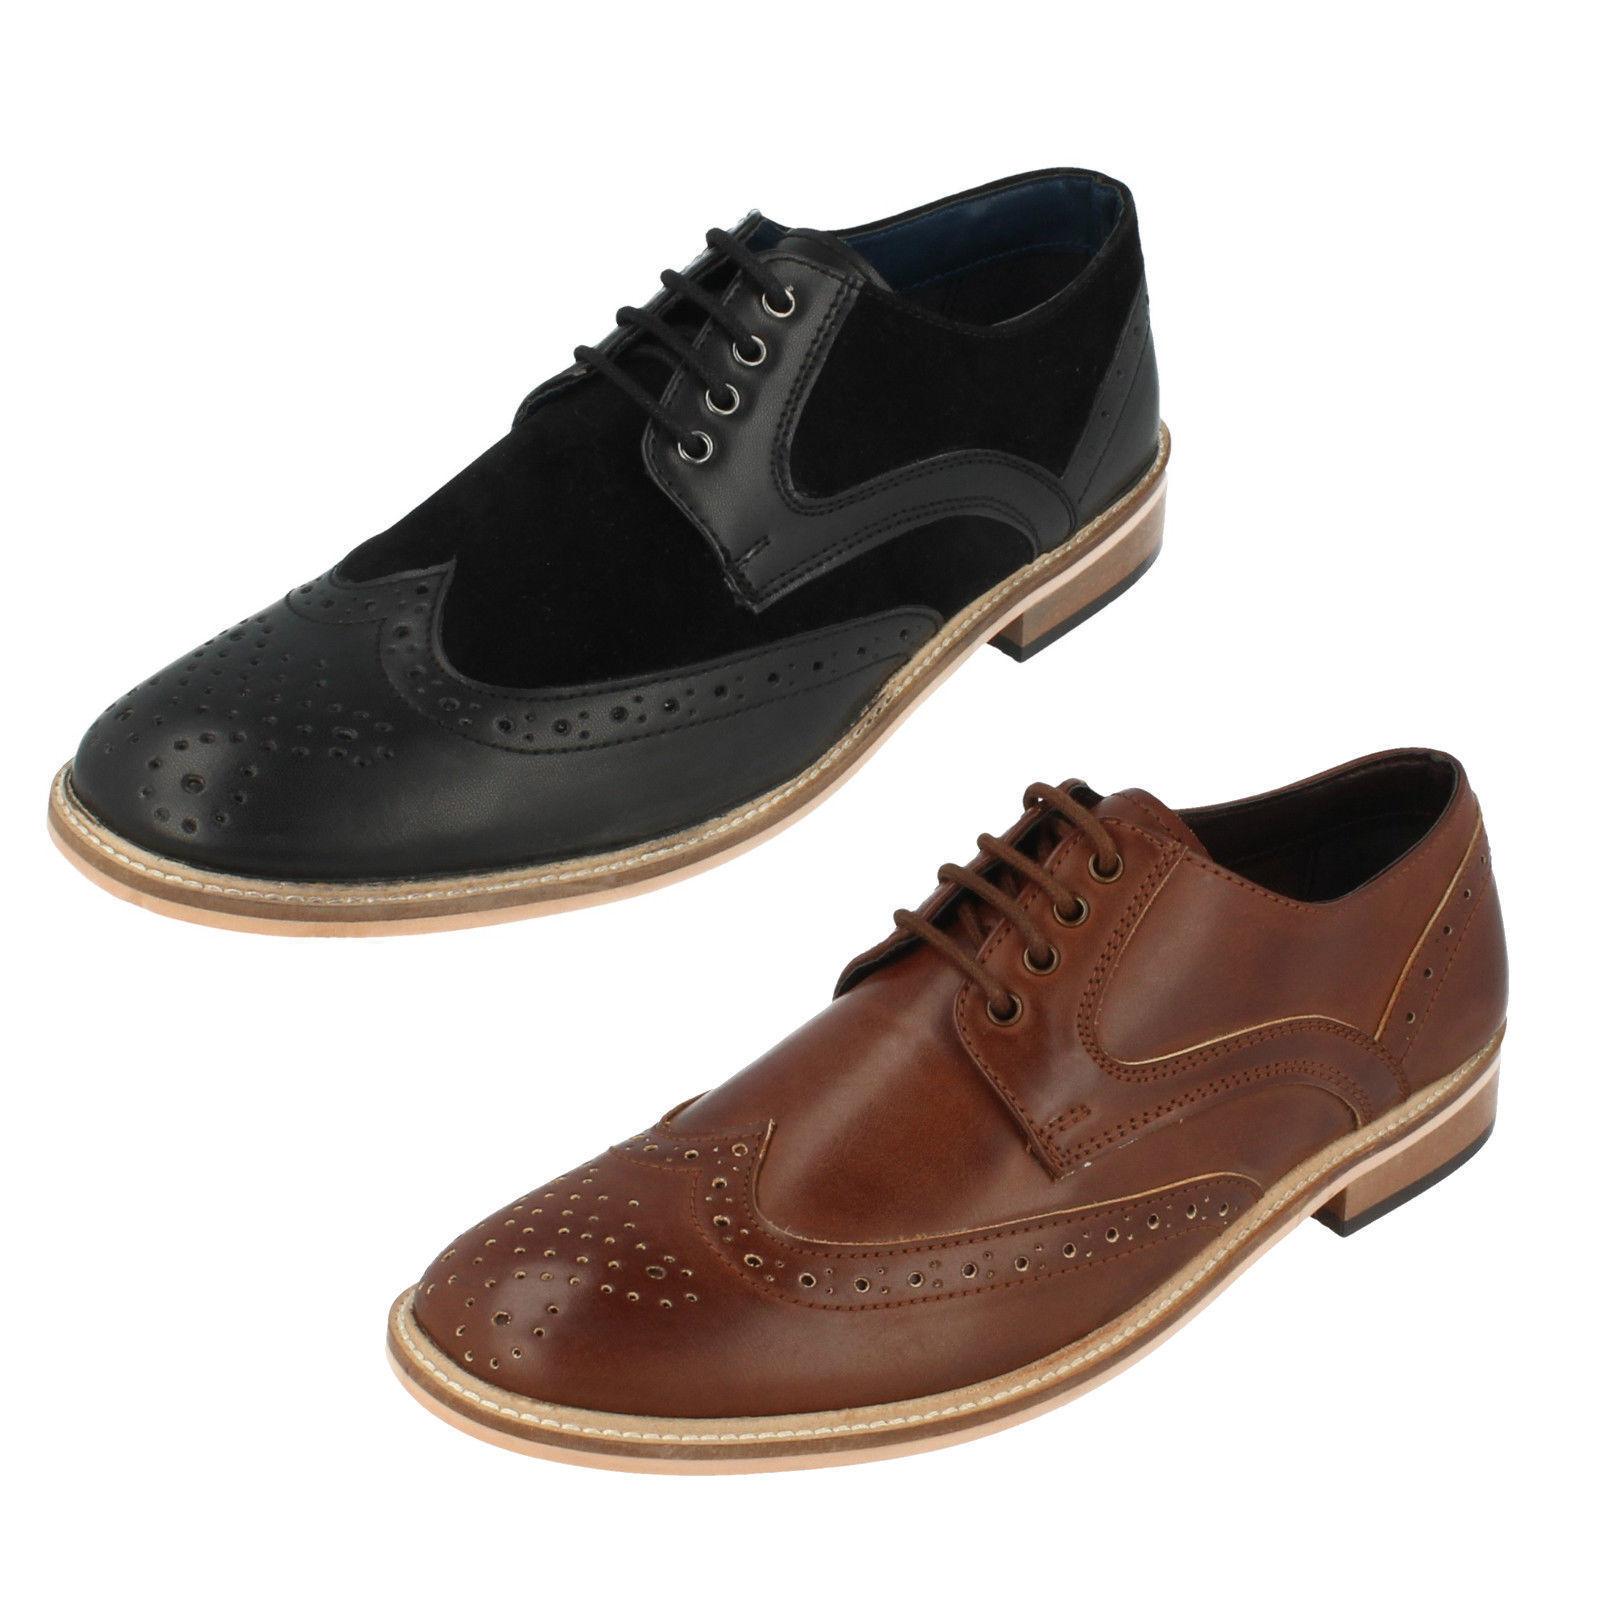 Mens Lambretta Bred shoe shoes Style 21004